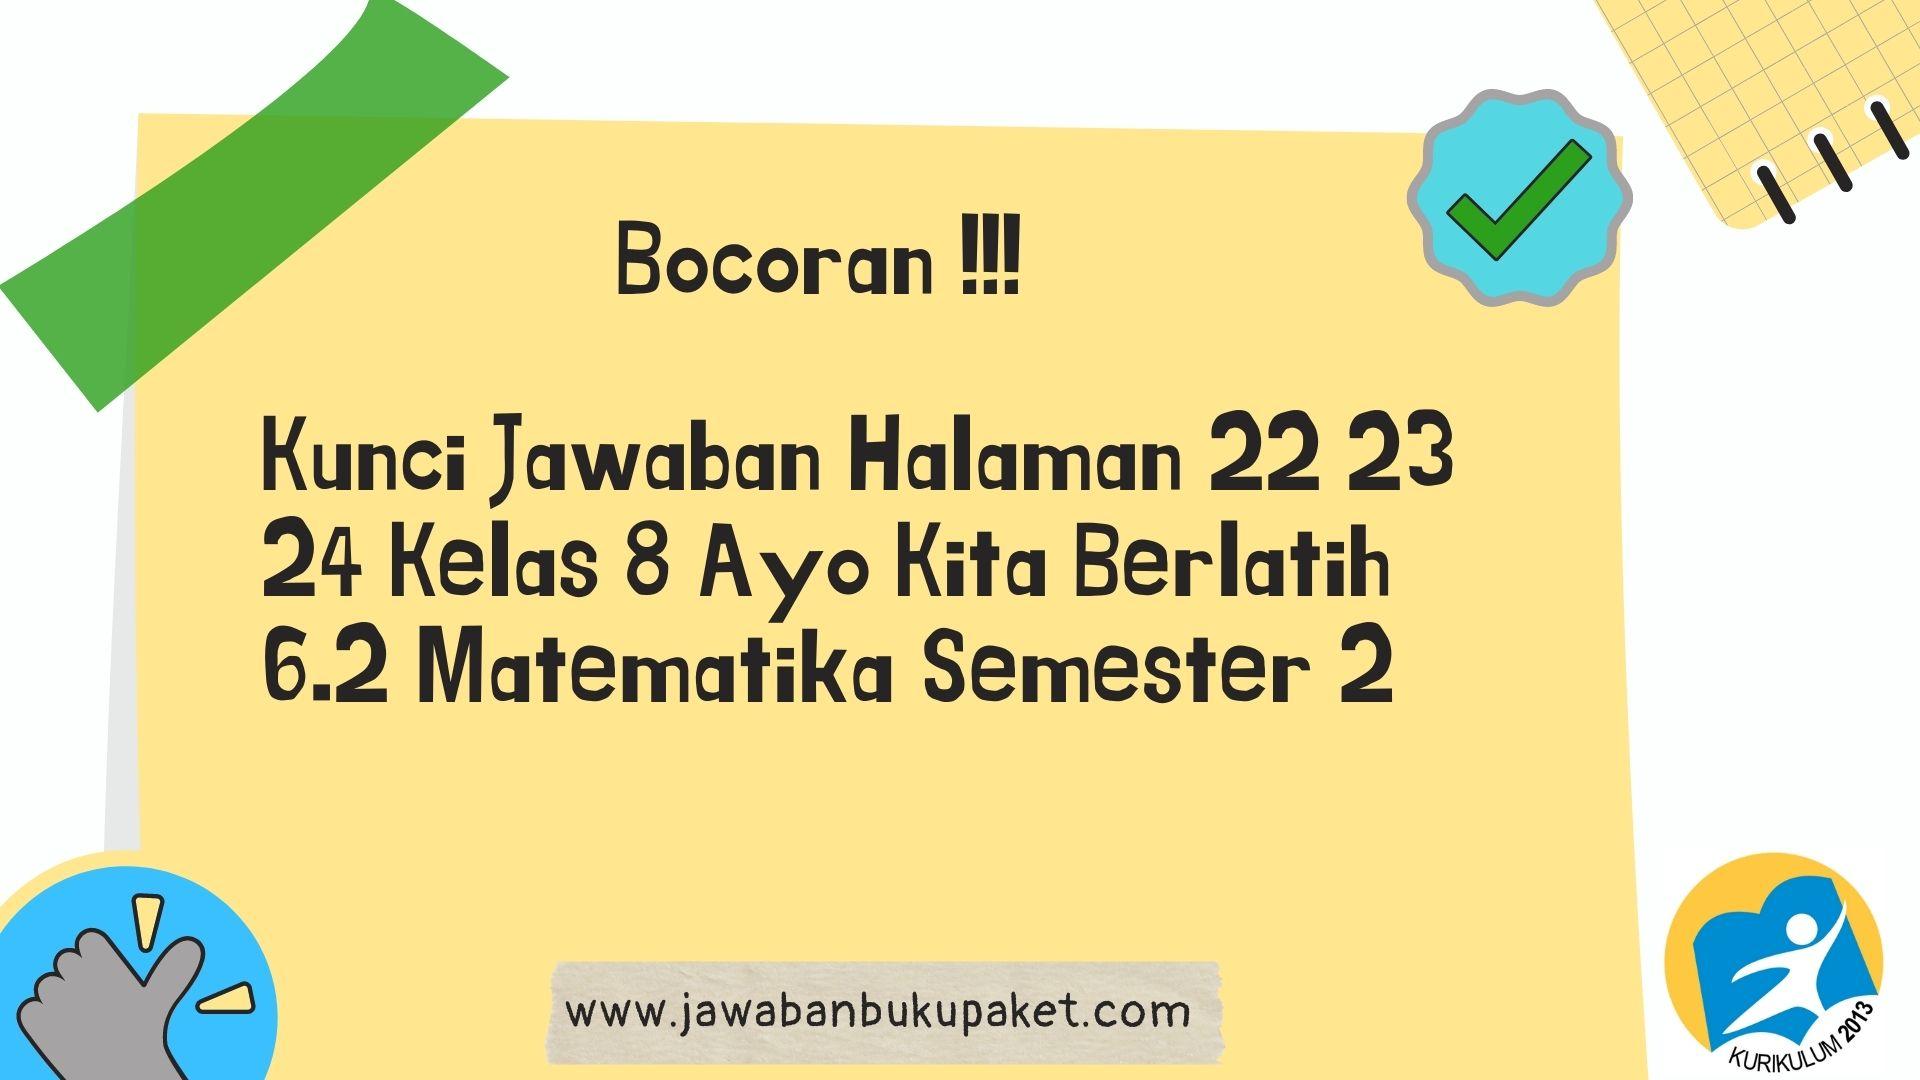 Kunci Jawaban Halaman 22 23 24 Kelas 8 Ayo Kita Berlatih 6.2 Matematika Semester 2 www.jawabanbukupaket.com